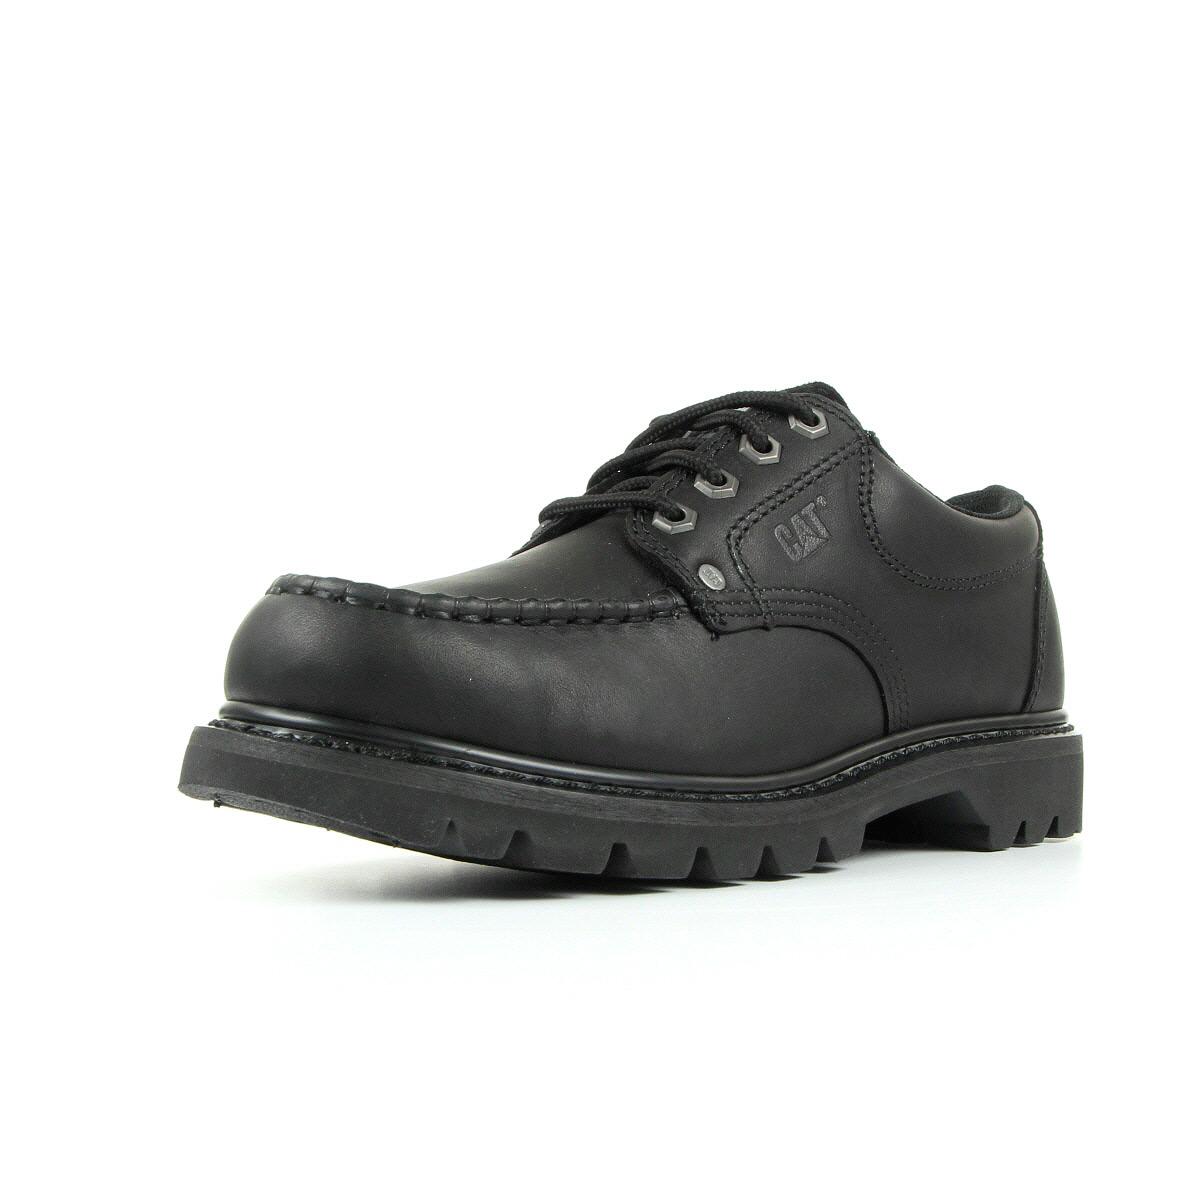 Chaussures ville basses caterpillar homme fenton taille noir noire cuir lacets ebay - Chaussure homme caterpillar ...